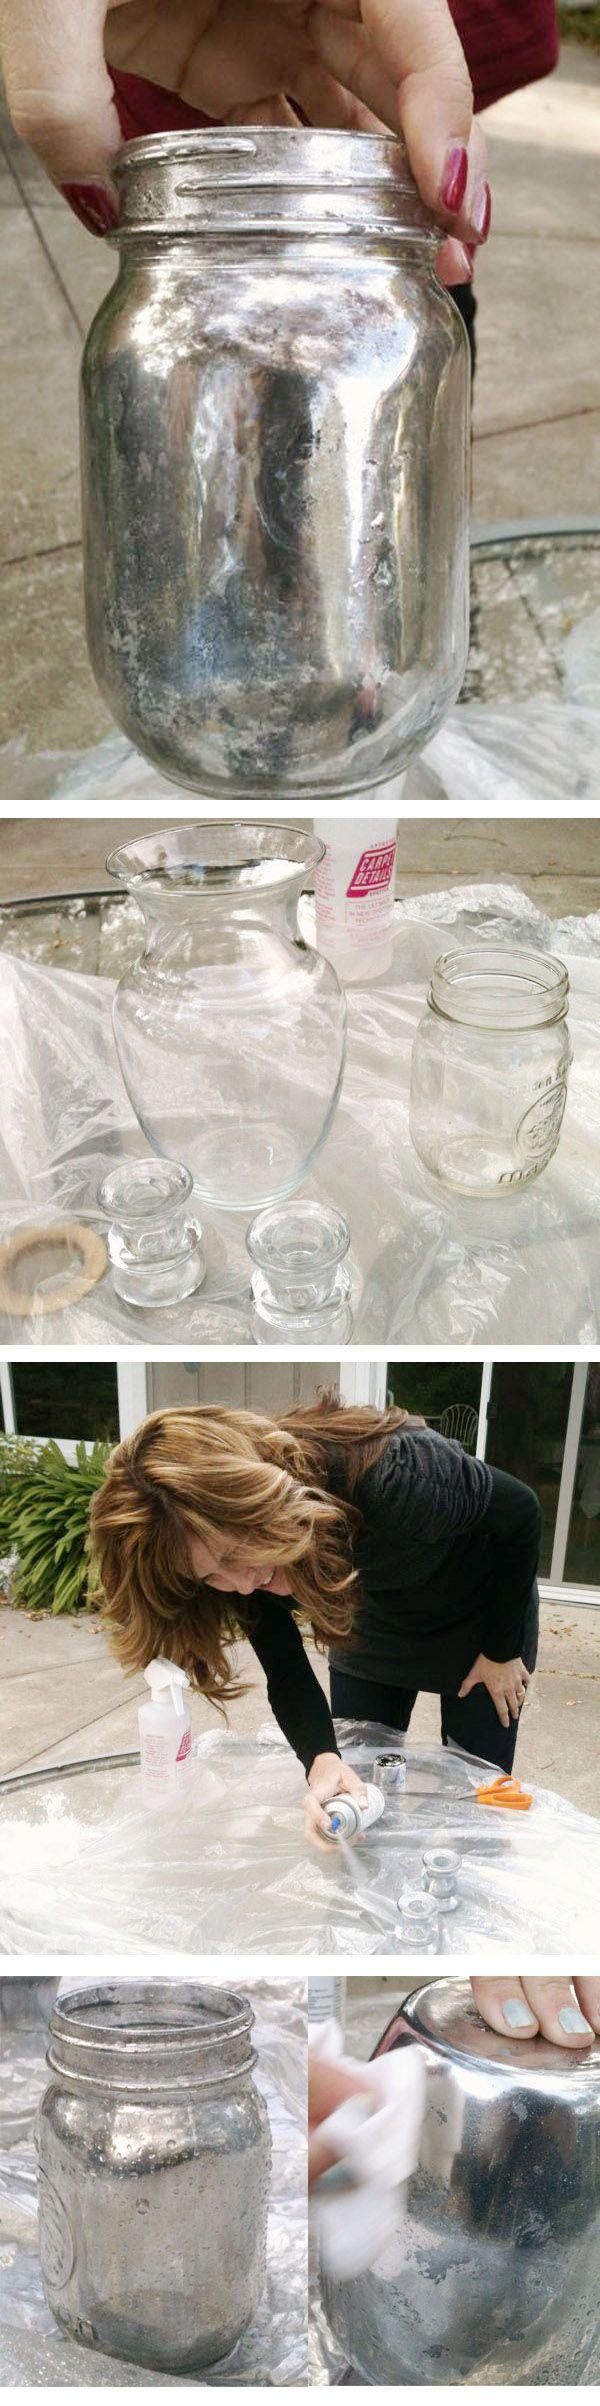 DIY  ::  Mercury Glass look :: glass jar, spray paint, vinegar, water, paper towel  ( http://www.katiesrosecottageblog.com/2012/02/mercury-glass-family-fun.html )